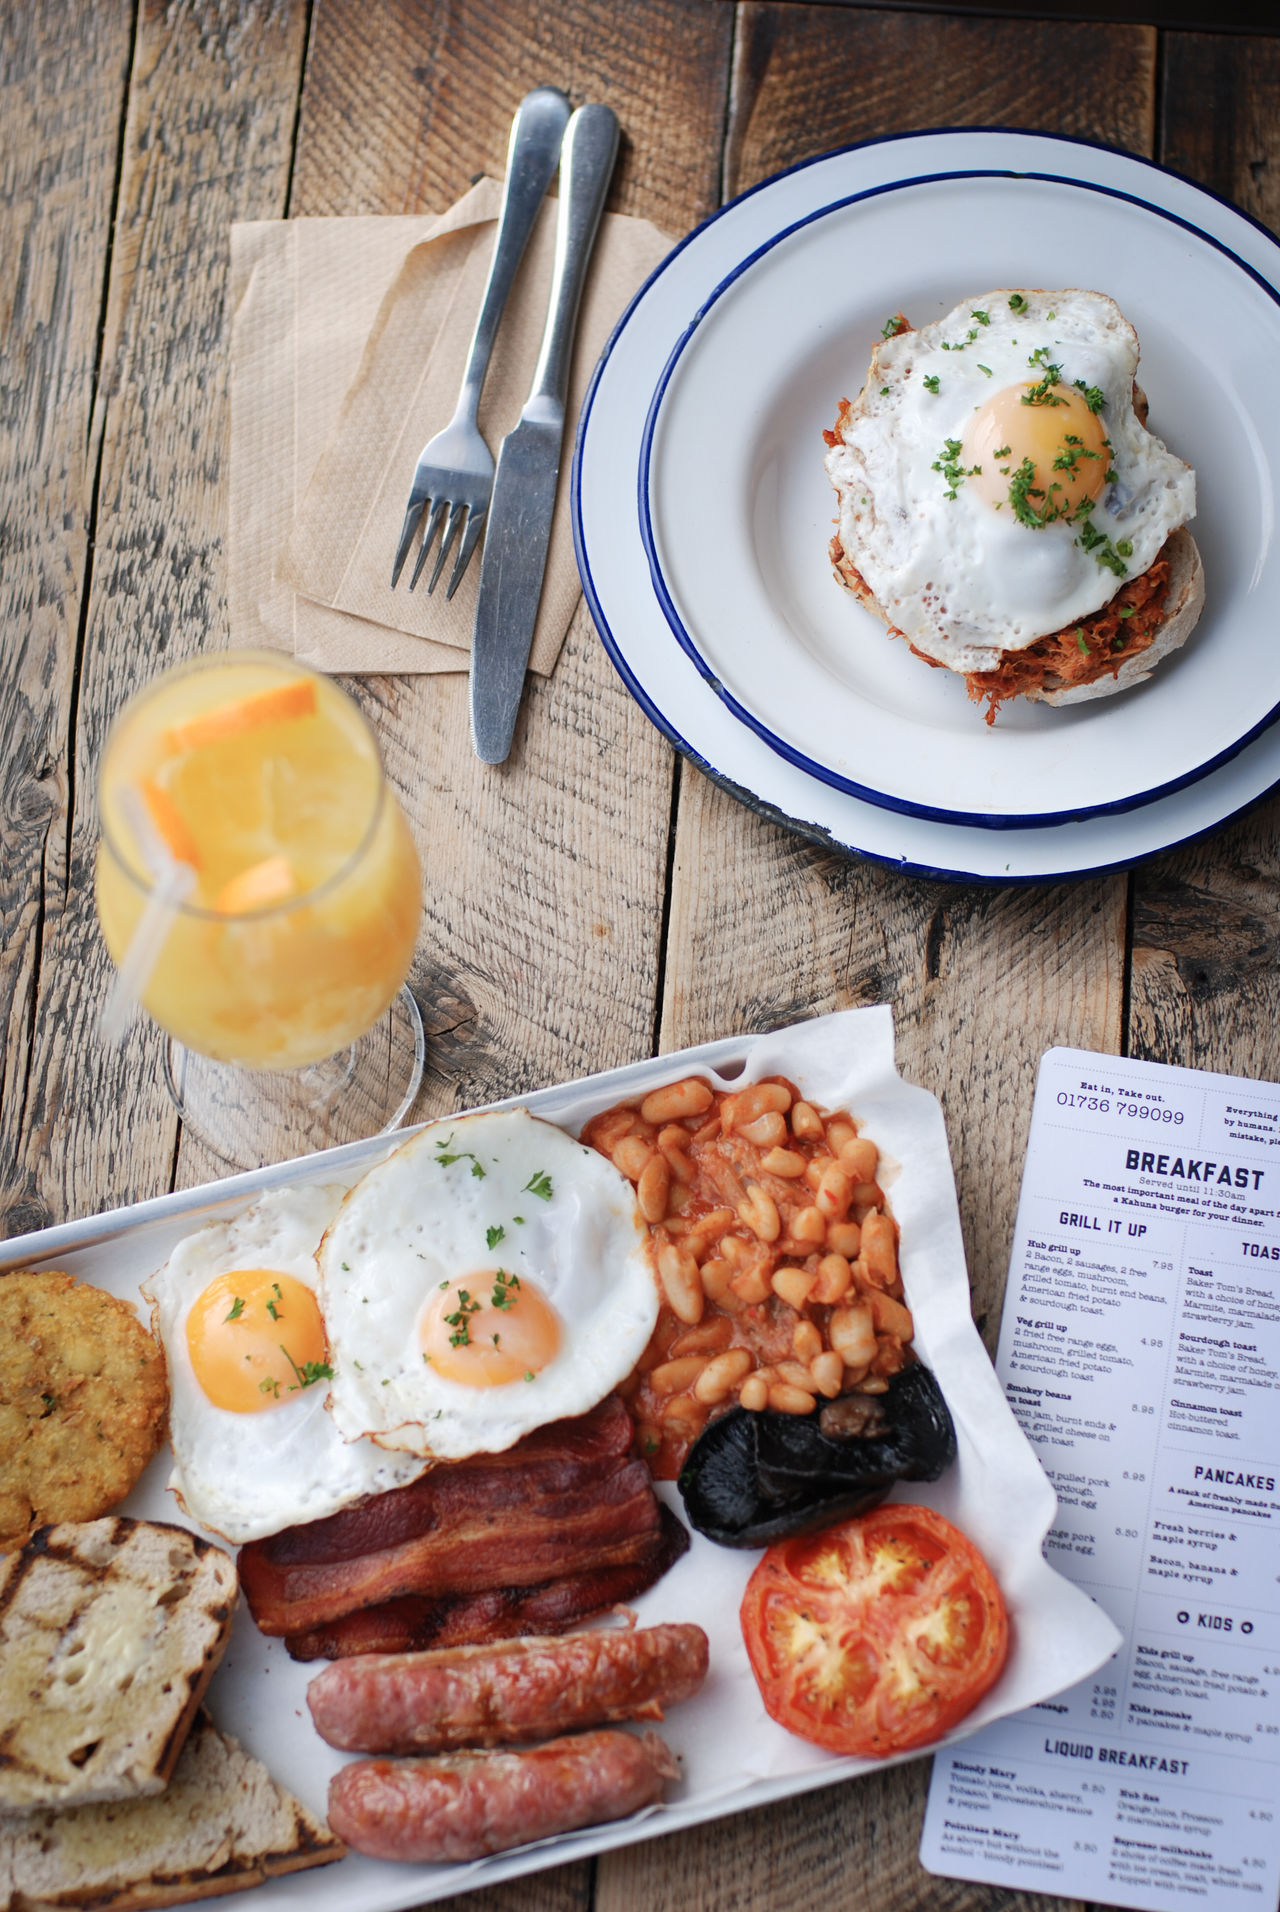 Beautiful stock photos of bier, food, egg, plate, breakfast